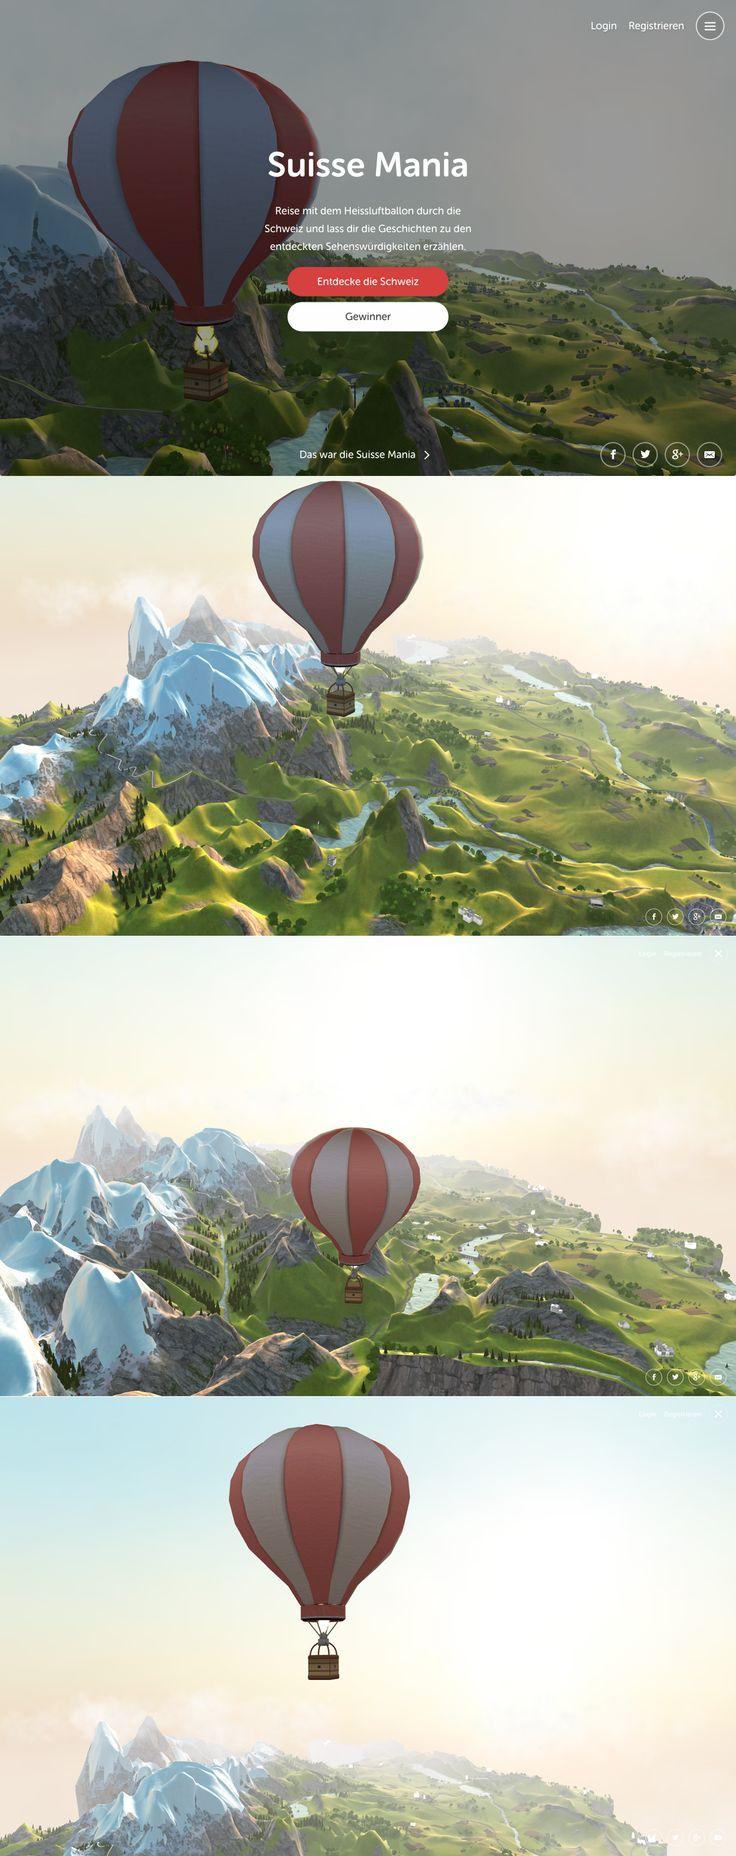 Suisse Mania - Die Schweiz in 3D  #hinderlingvolkart #design #3D #Cutting-Edge #Game #Map based #WebGL  http://suissemania.ch/